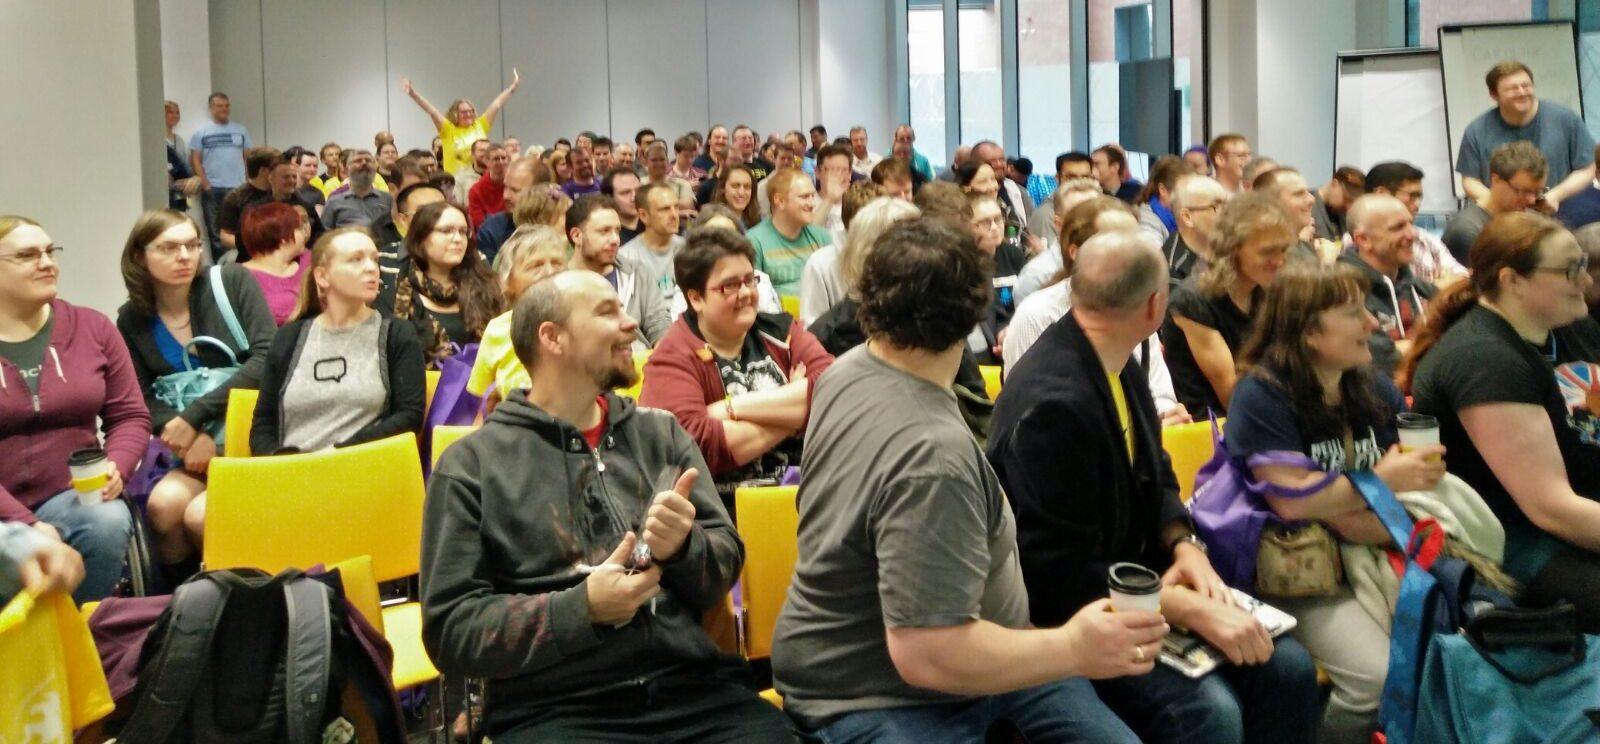 BarCamp Manchester 2017 – cancelled